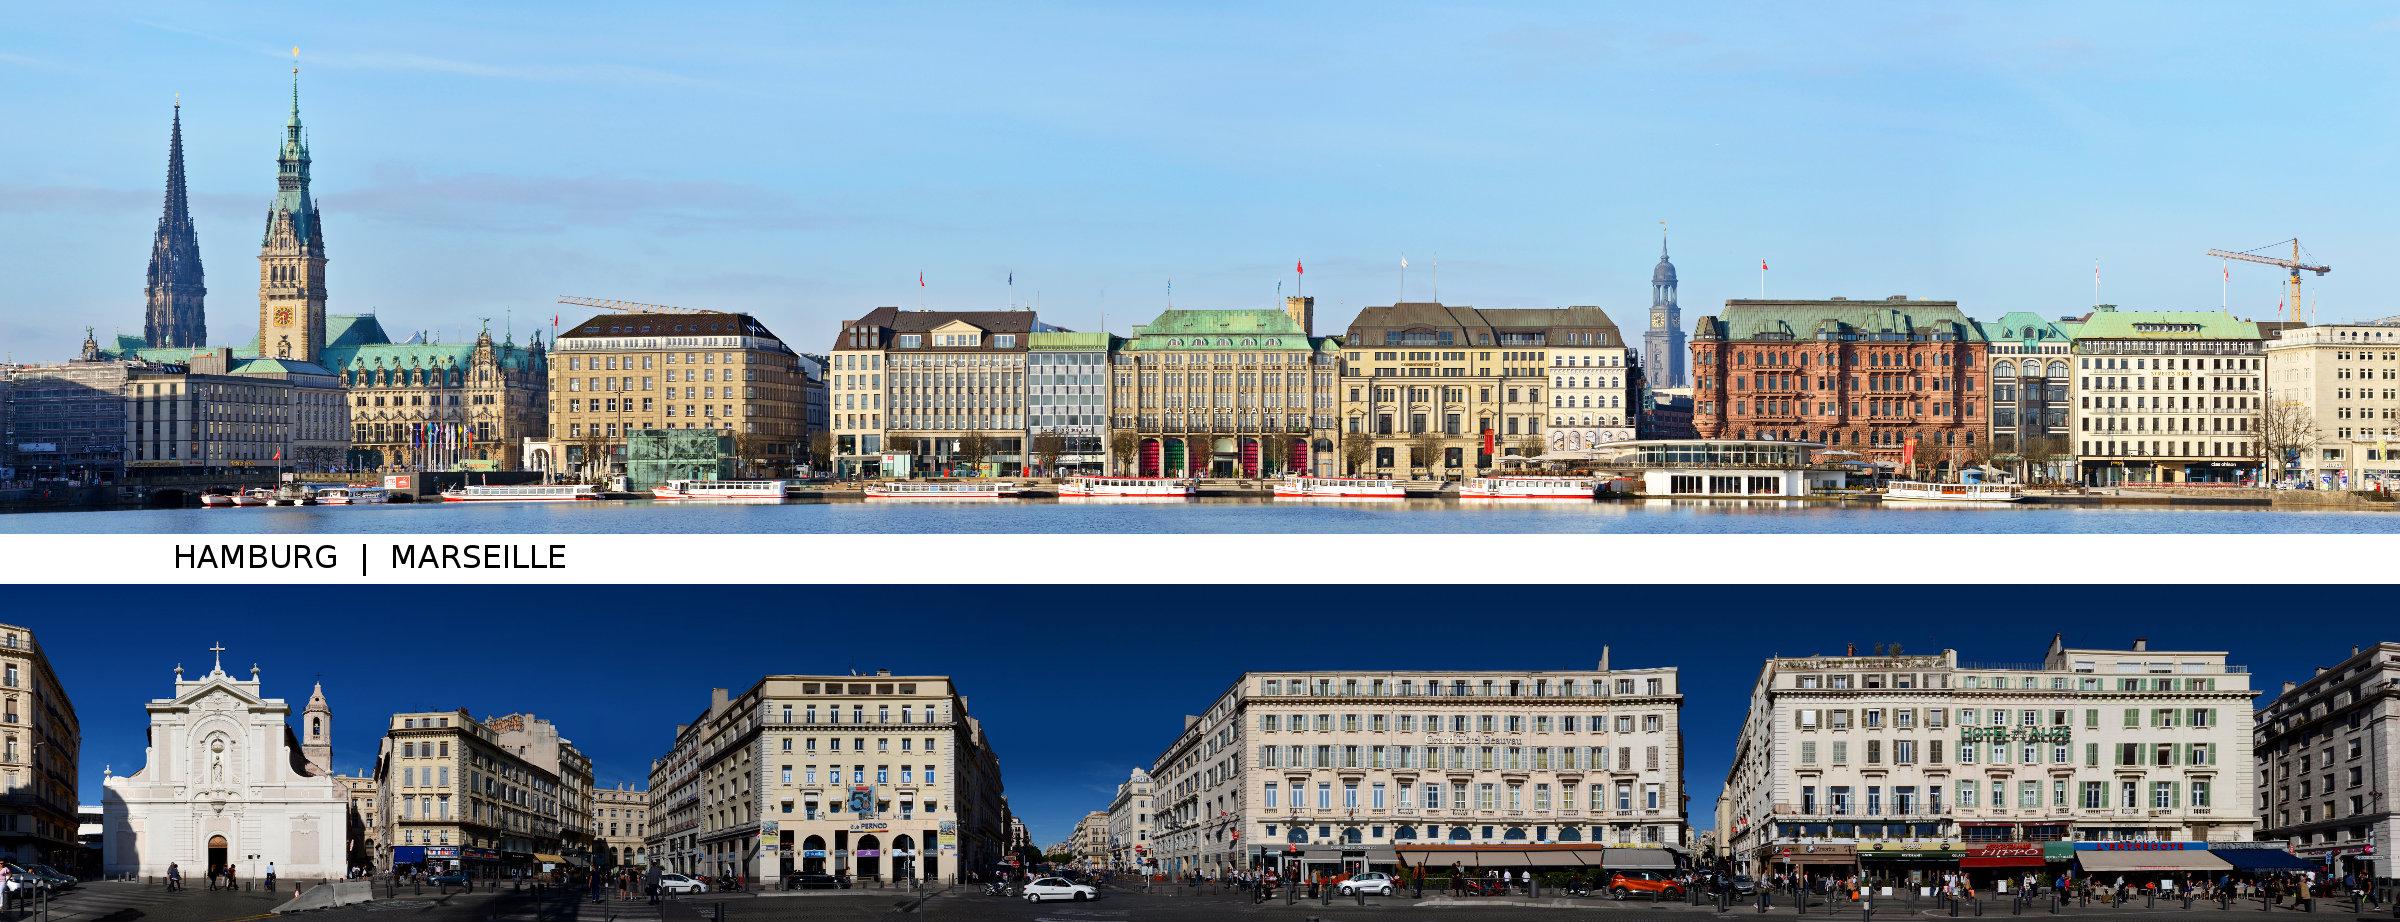 Hamburg | Marseille Exhibition Heritage Architecture